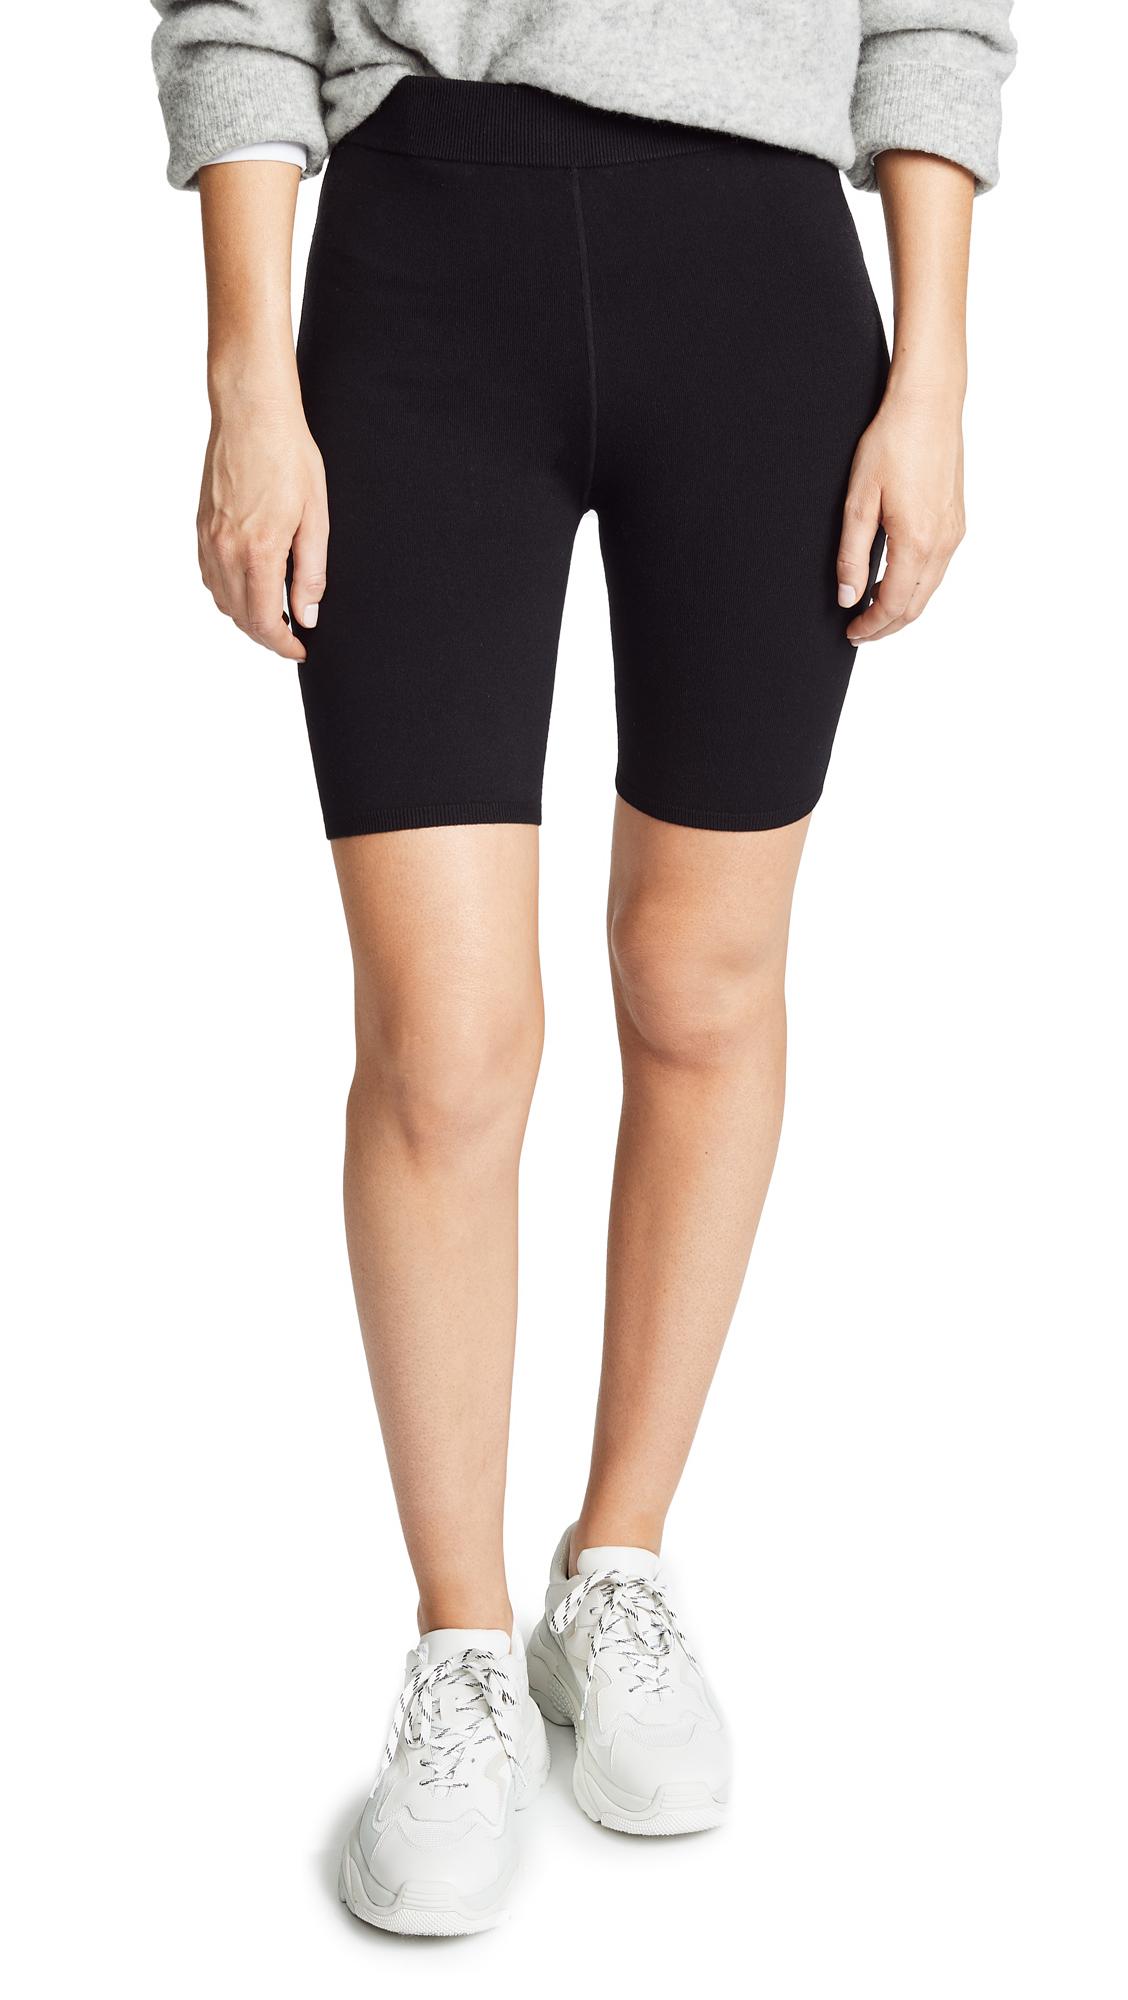 alexanderwang.t Bodycon Basic Biker Shorts - Black